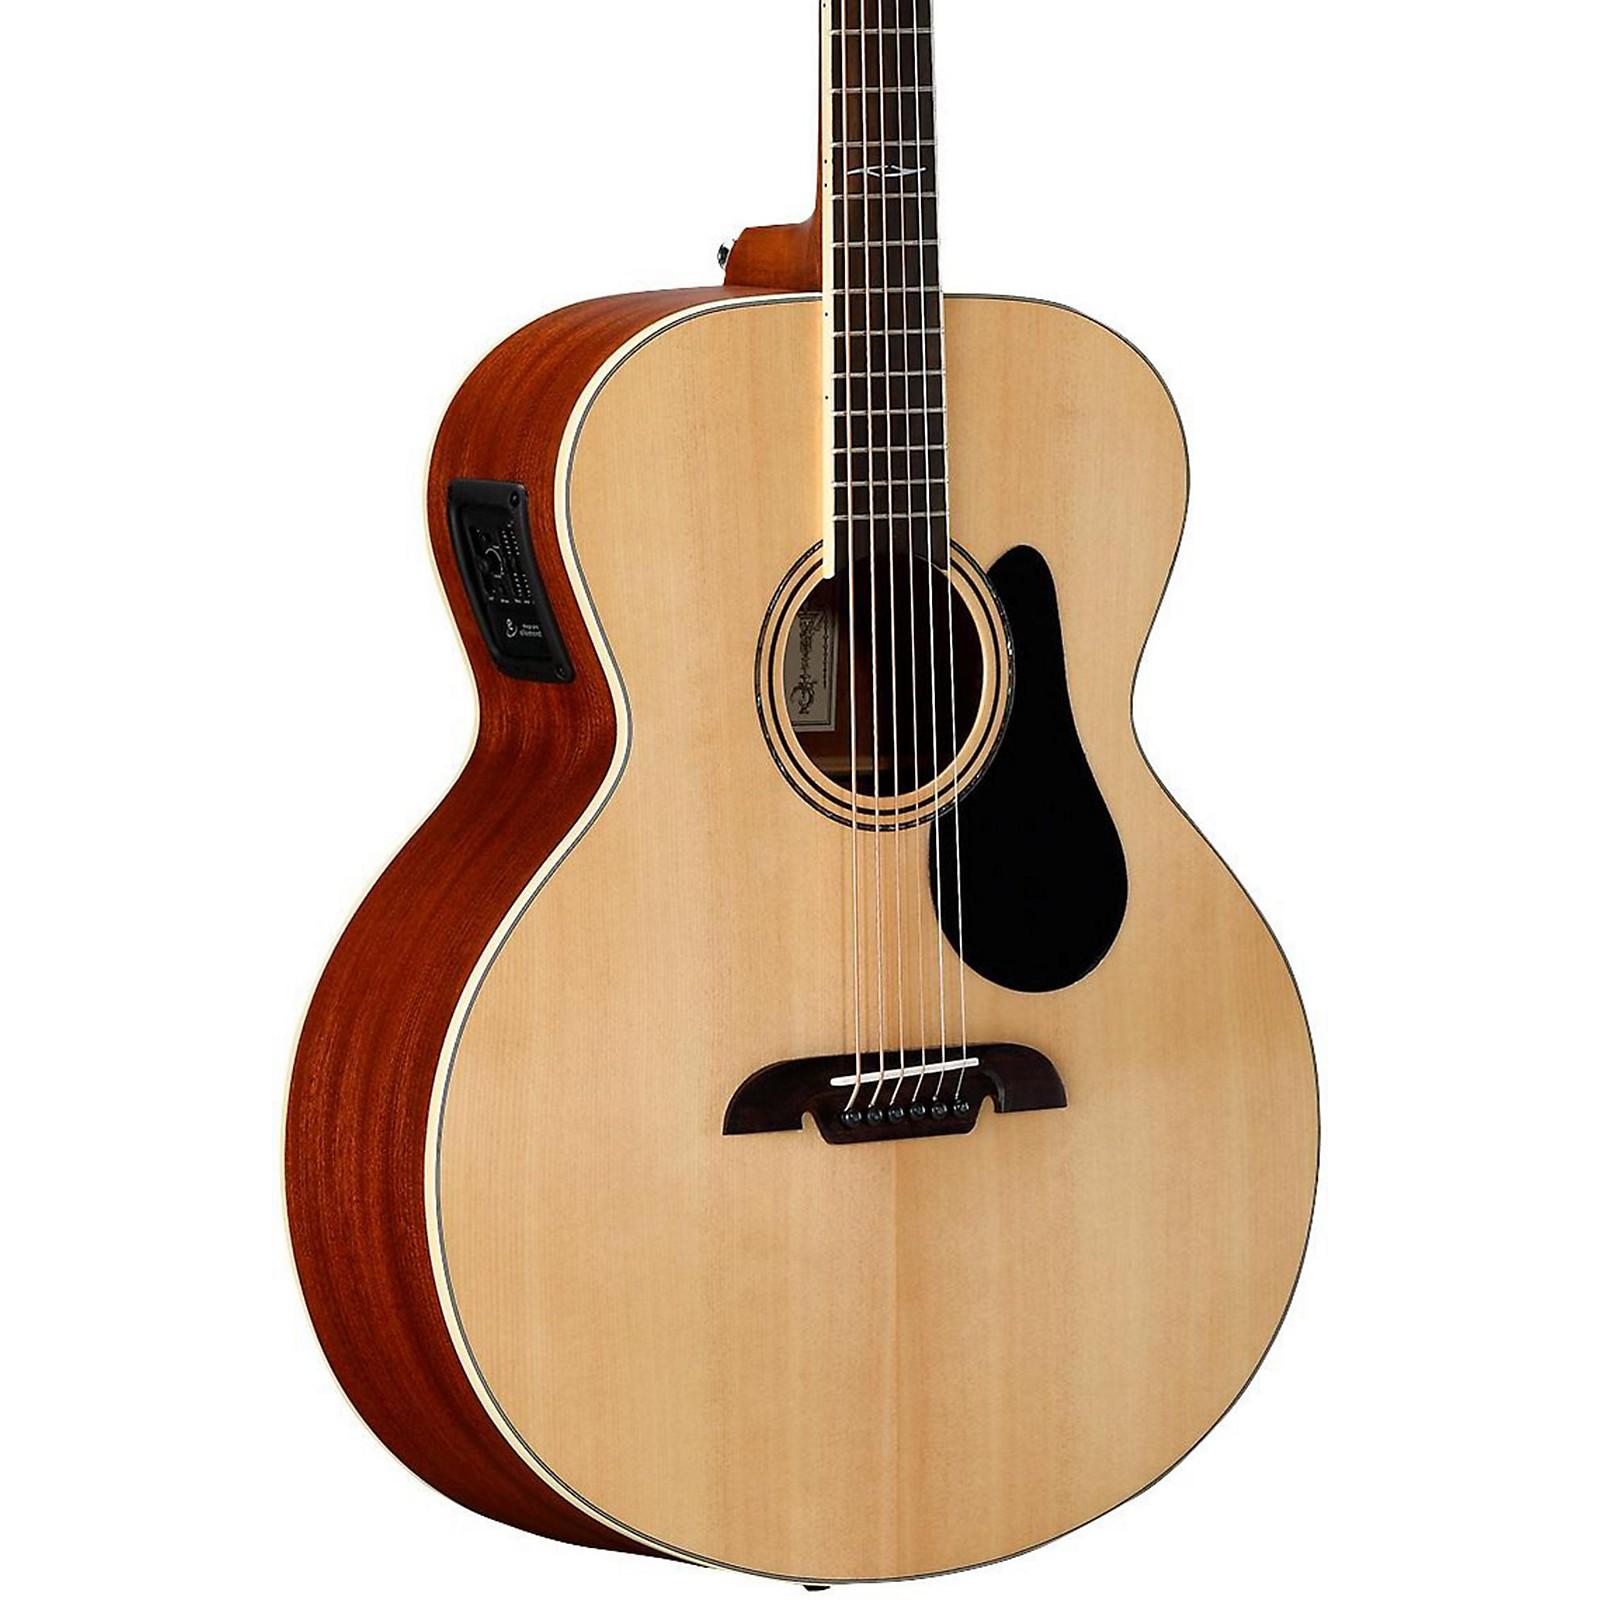 Alvarez Artist Series Acoustic-Electric Baritone Guitar